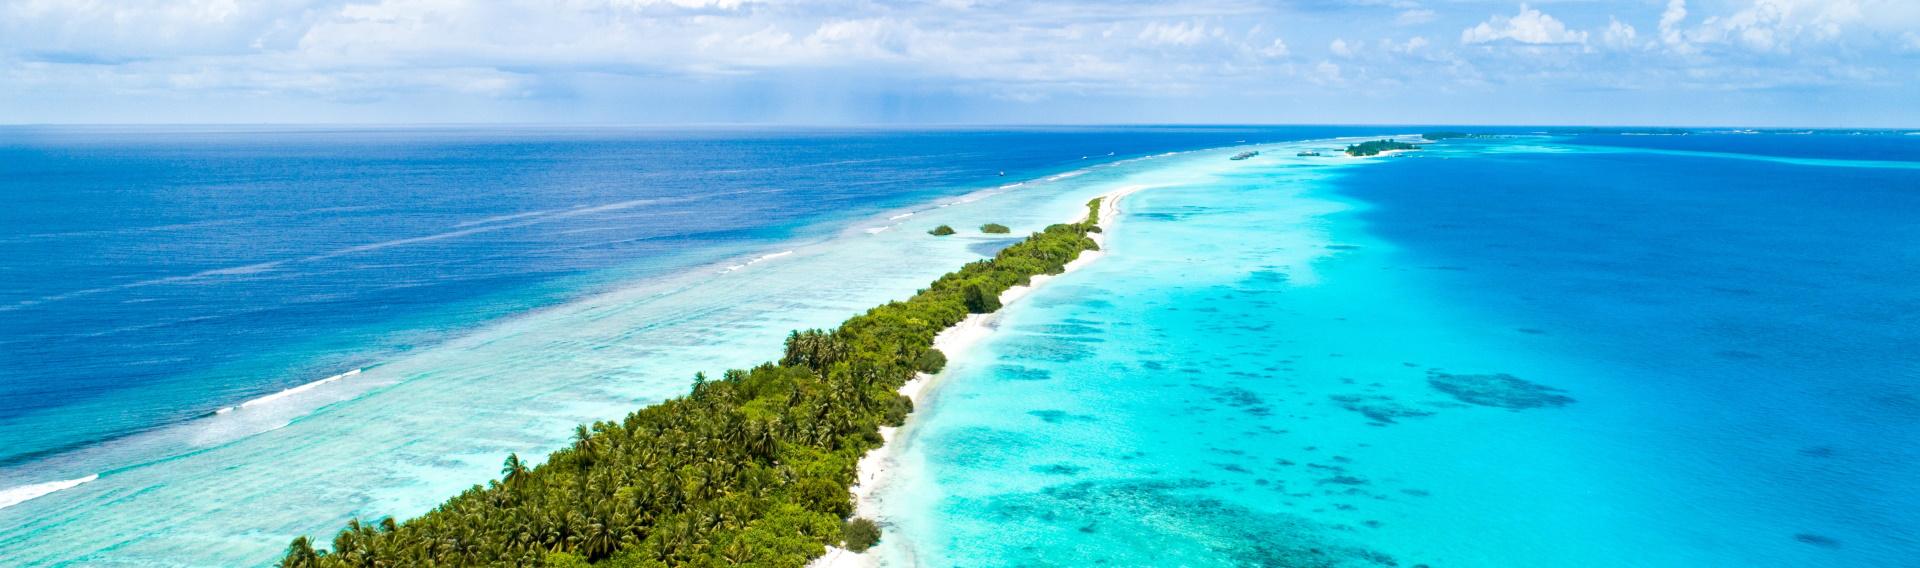 voyage maldives expatriés